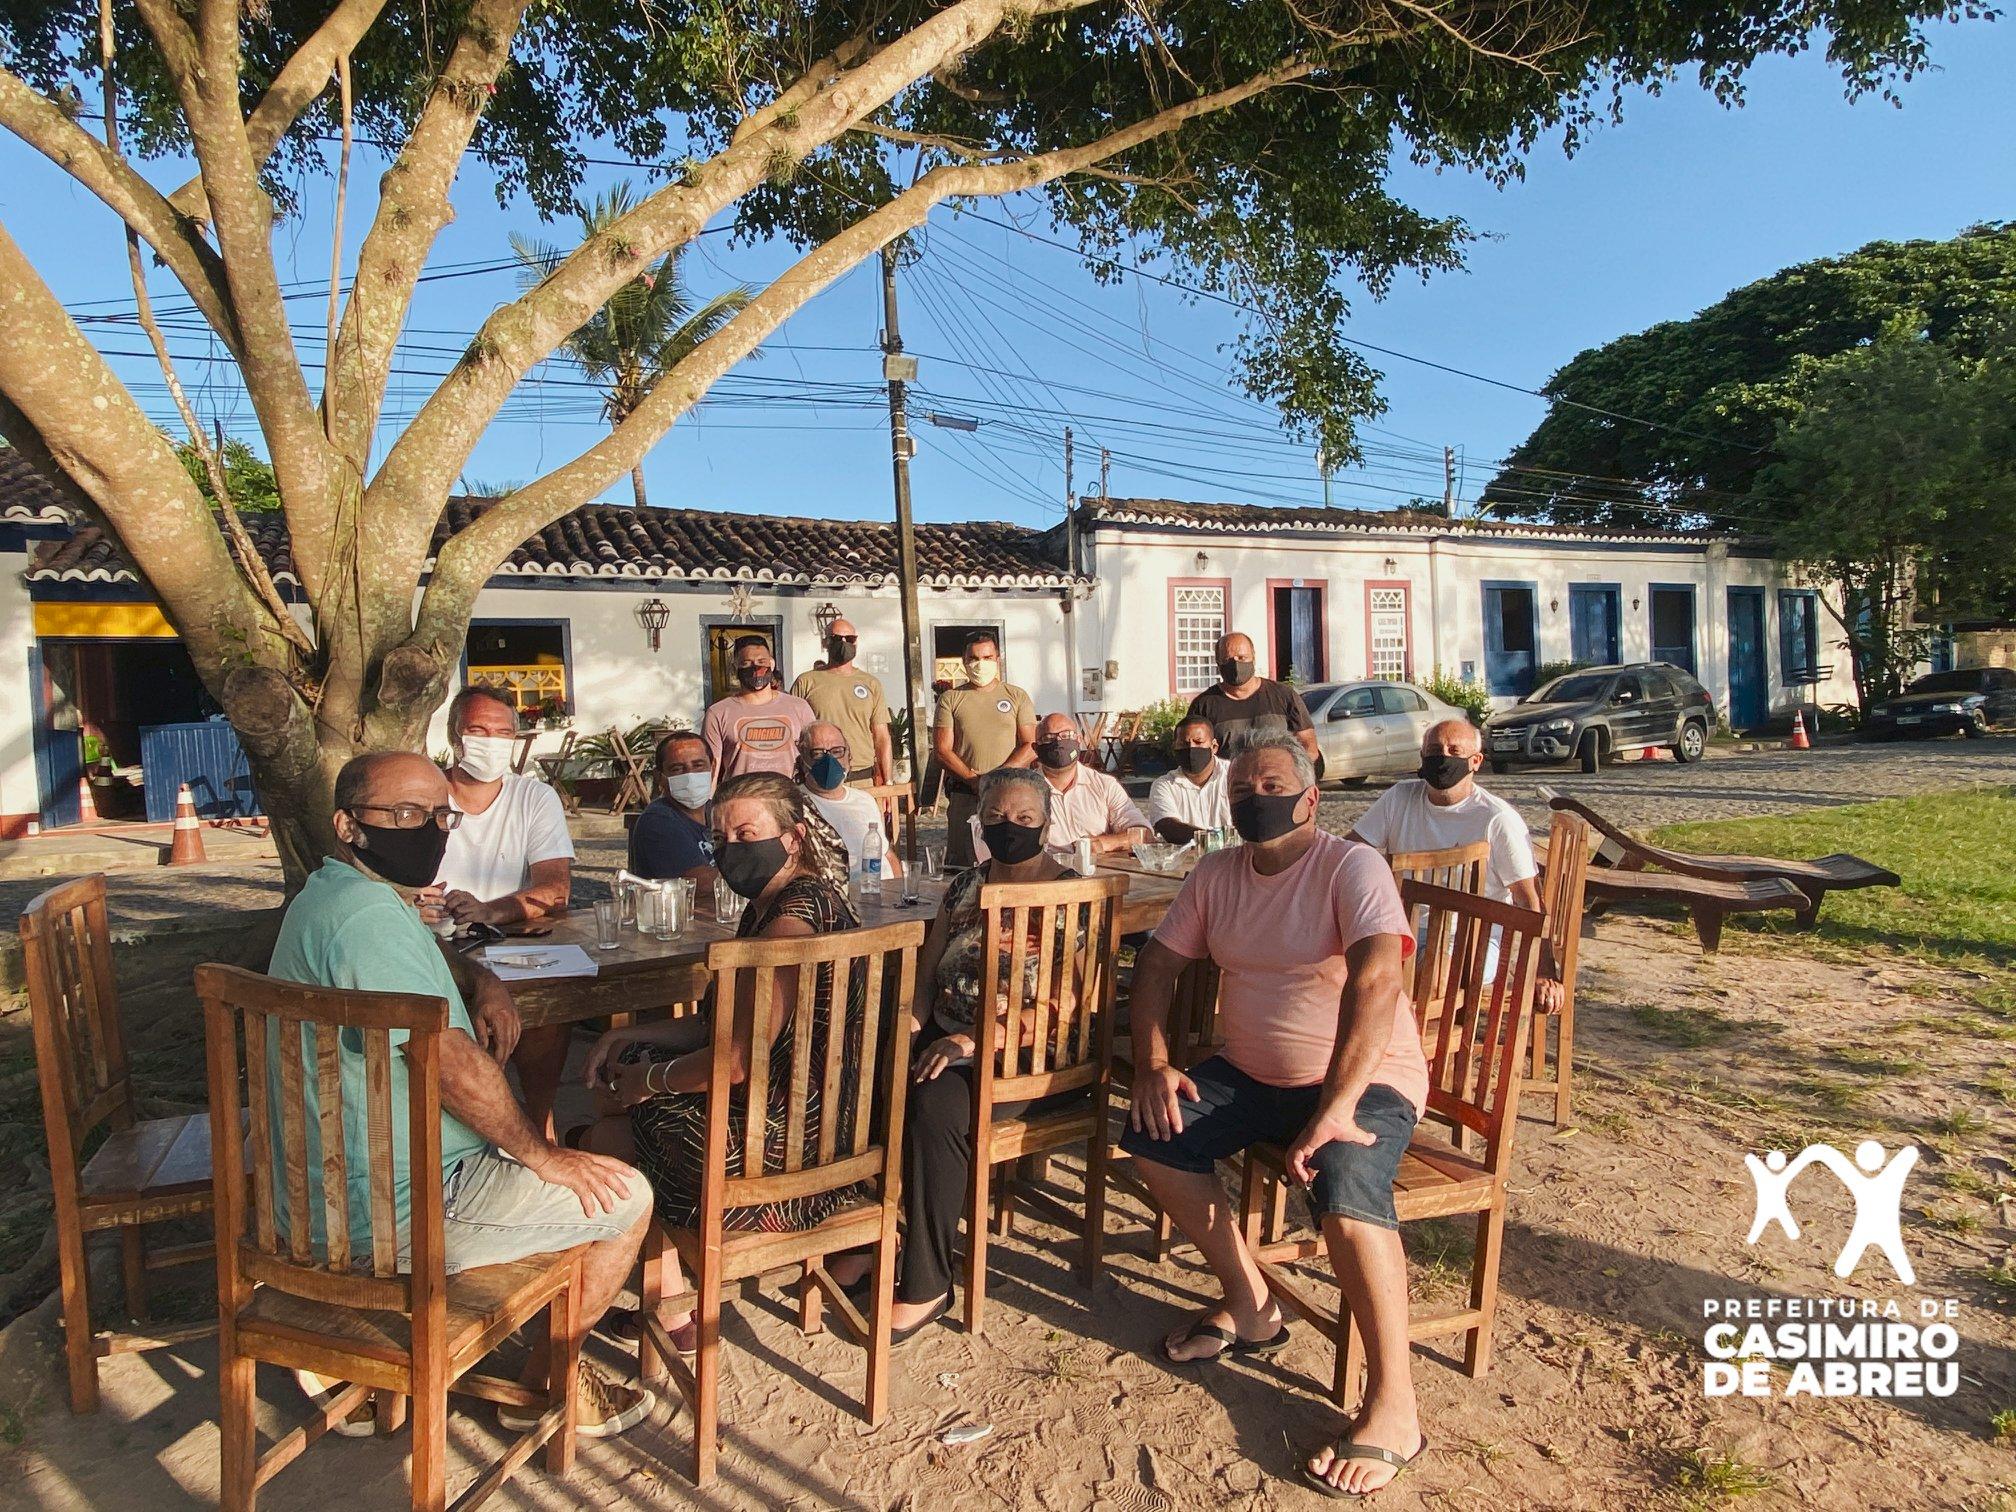 Circuito Gastronômico e Cultural da Beira-Rio fortalecido